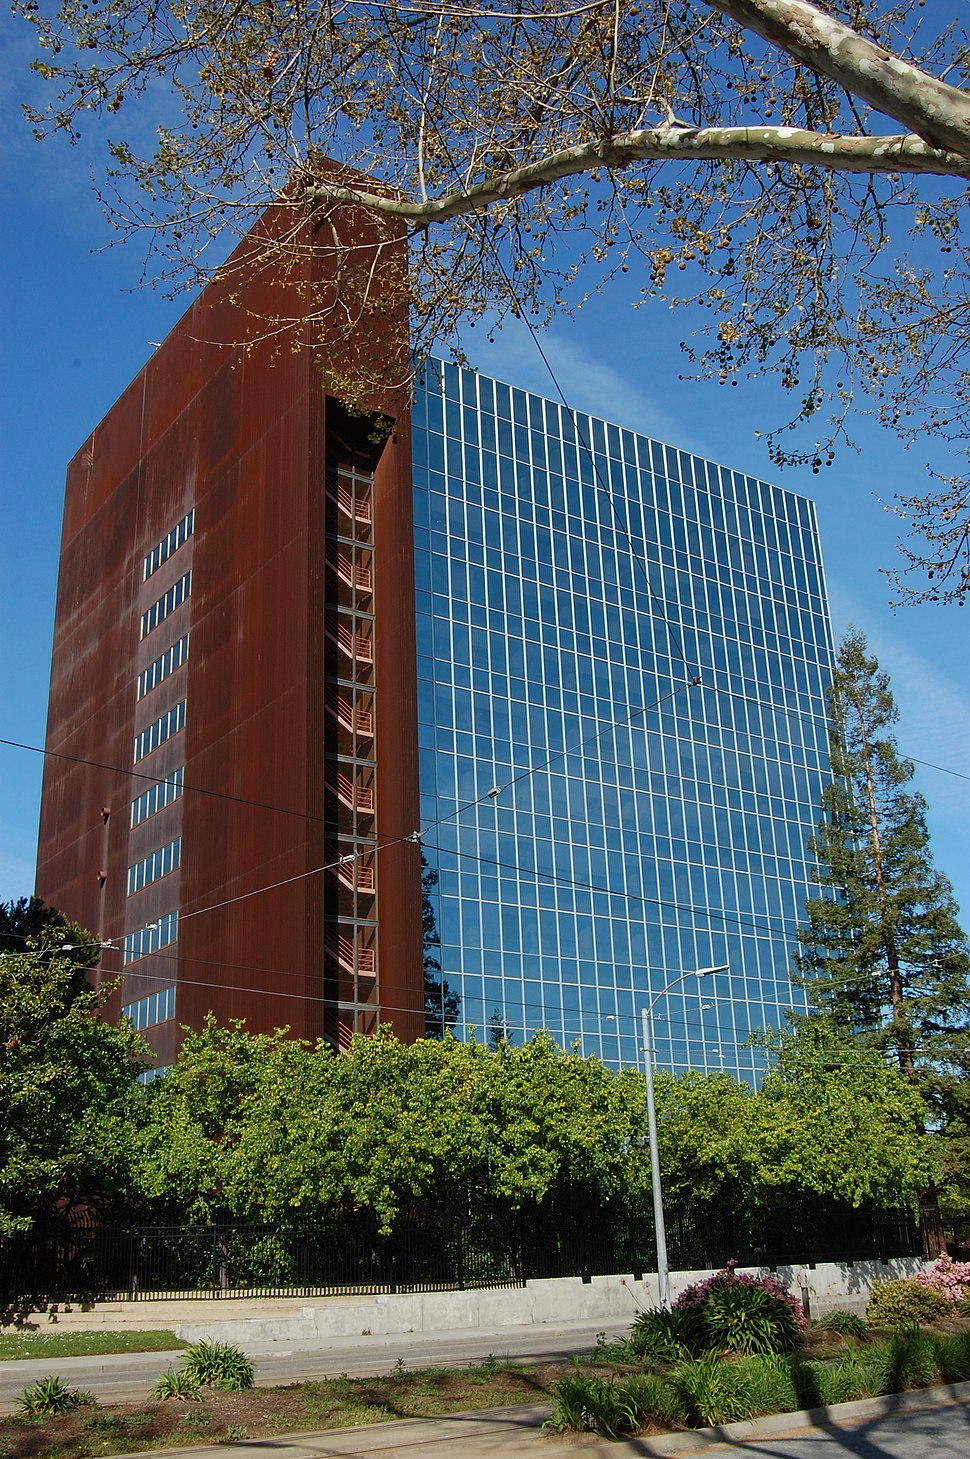 USA-San Jose-70 West Hedding Street-East Wing-2